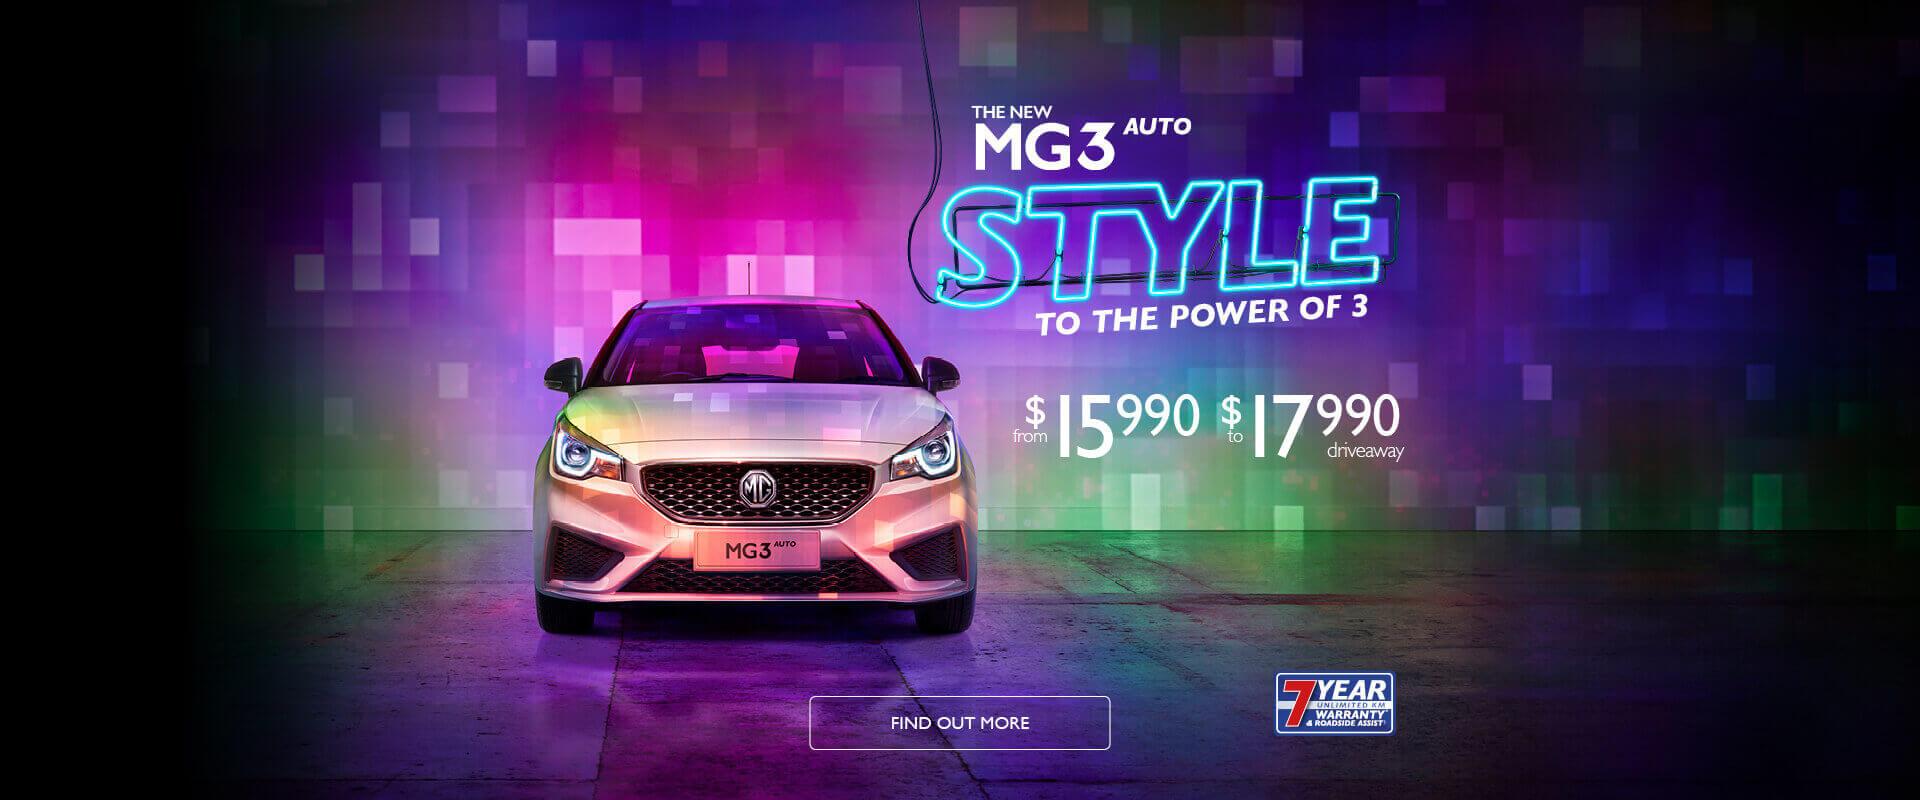 New MG3 Auto